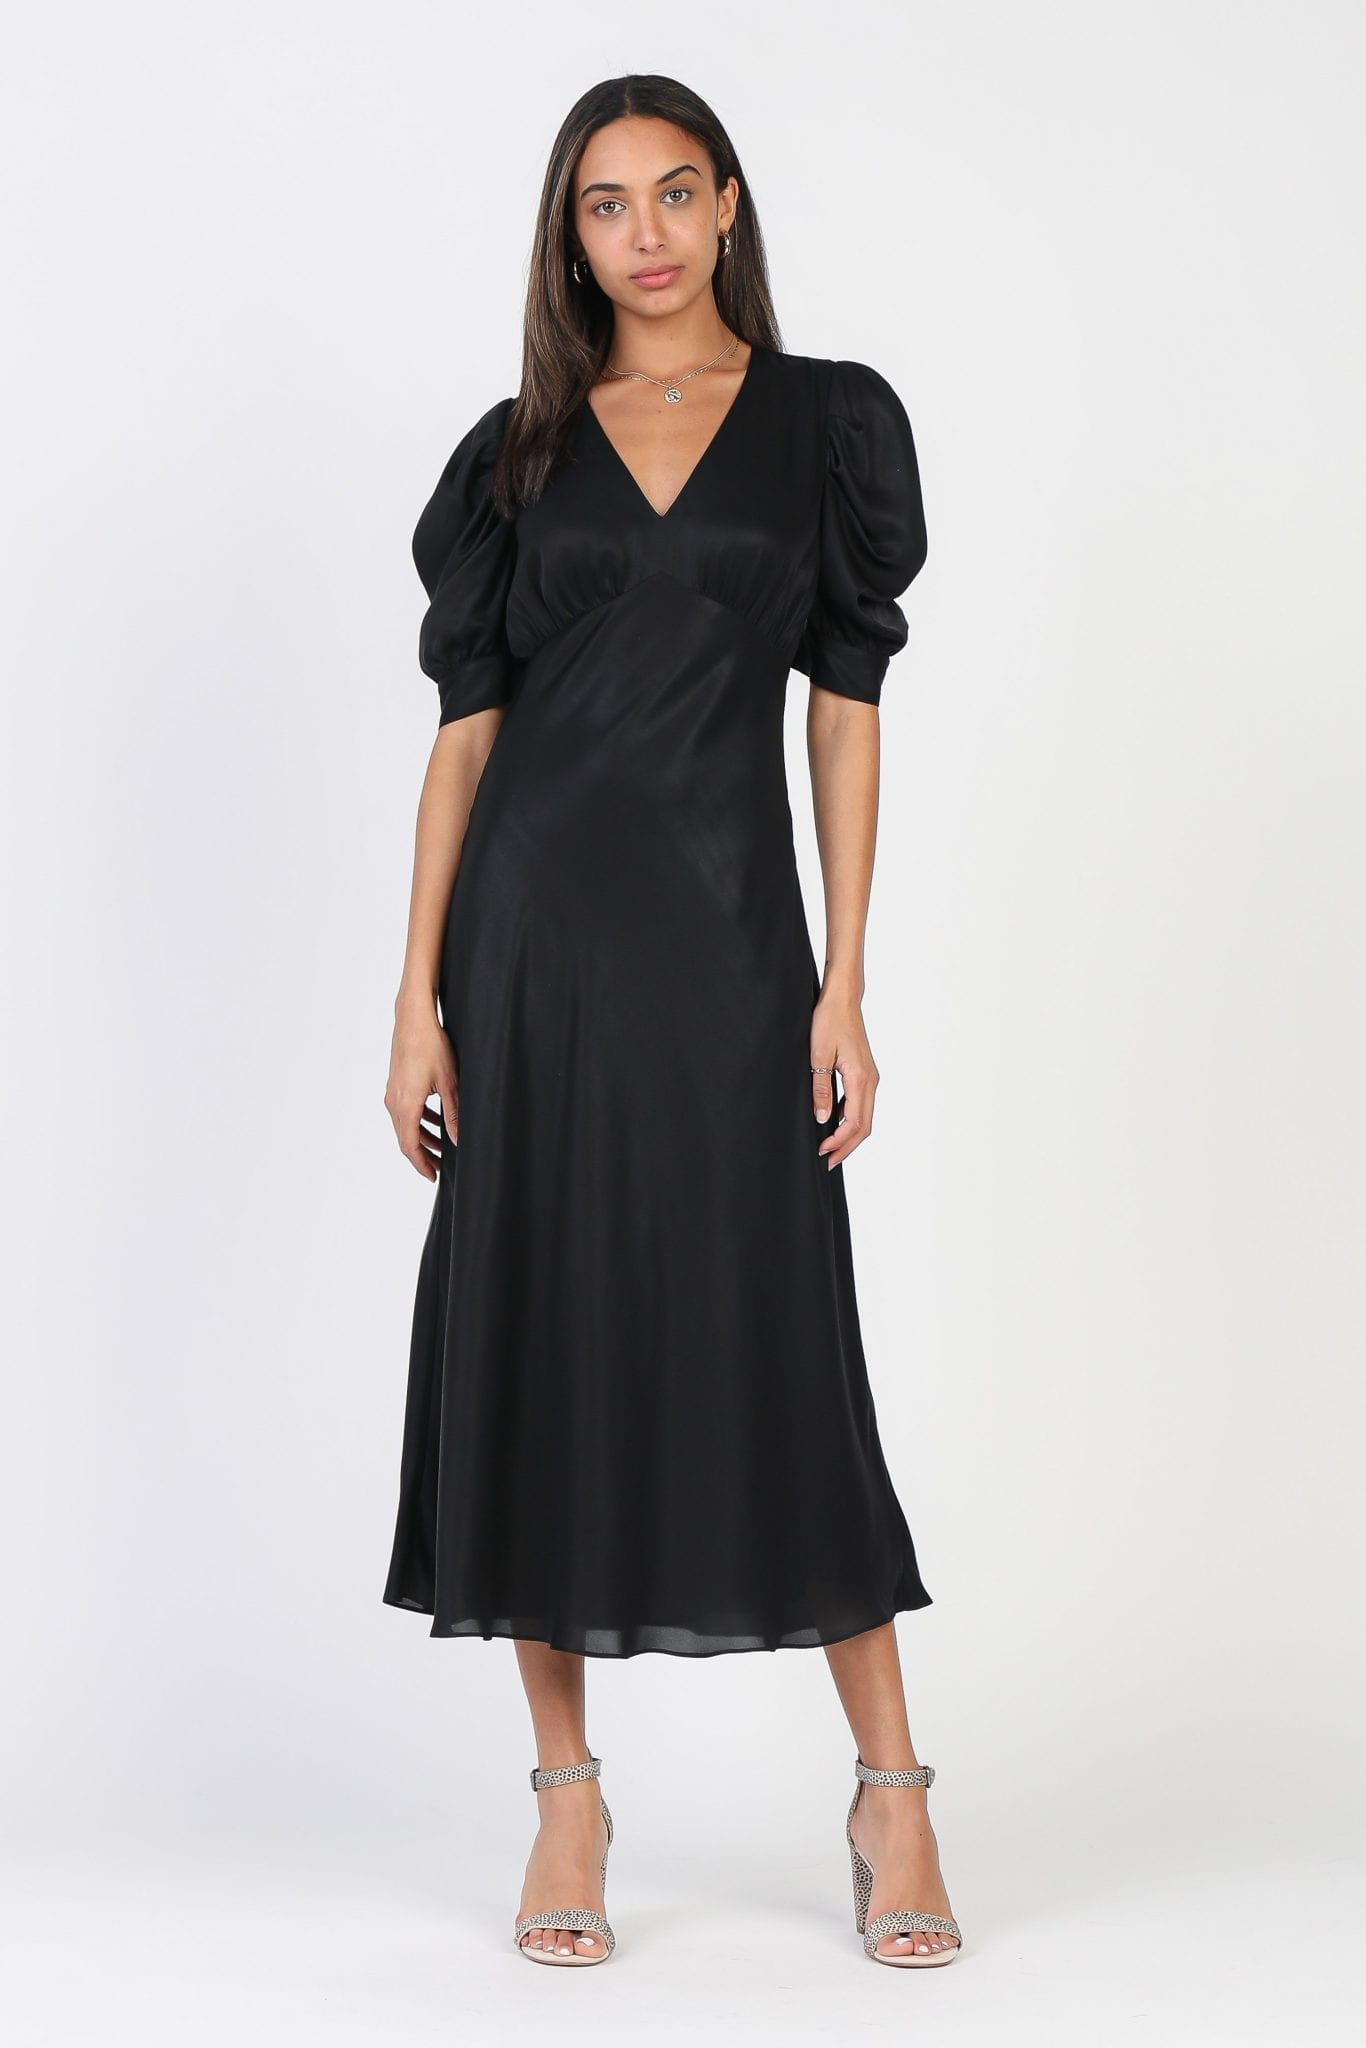 SHOPCURRENTAIR Puff Sleeve Black Midi Dress